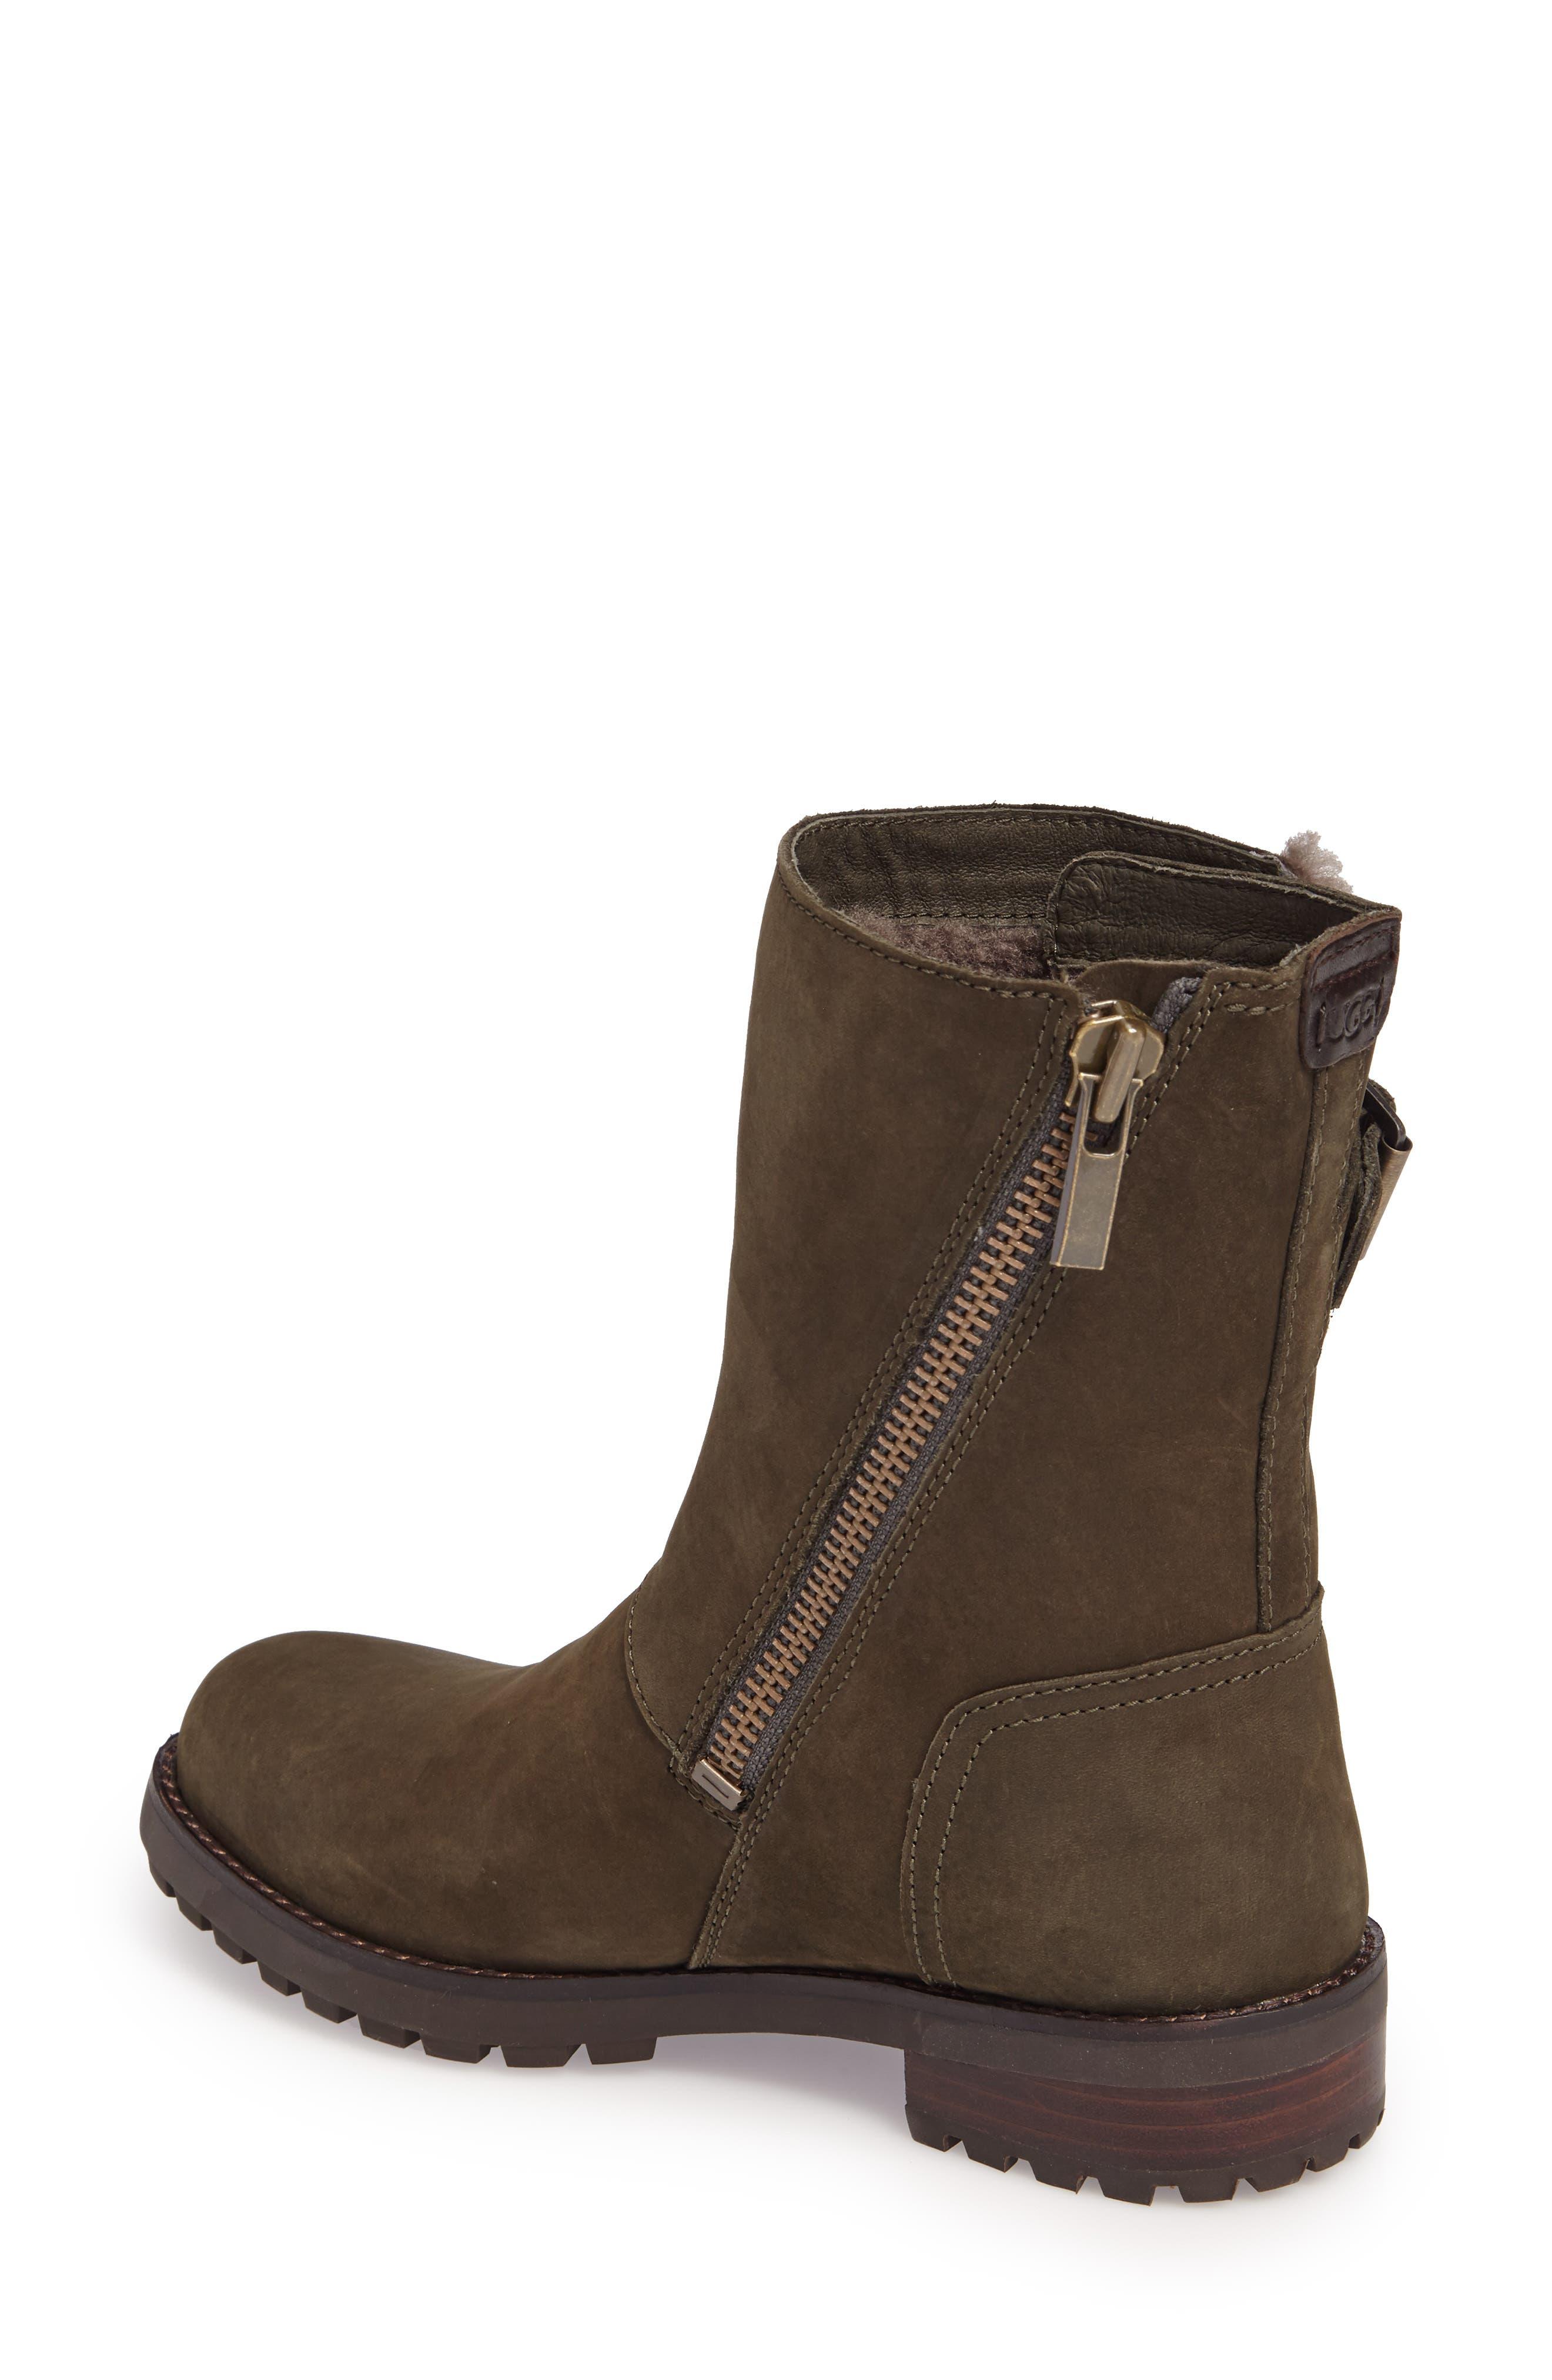 Alternate Image 2  - UGG® Niels Water Resistant Genuine Shearling Boot (Women)